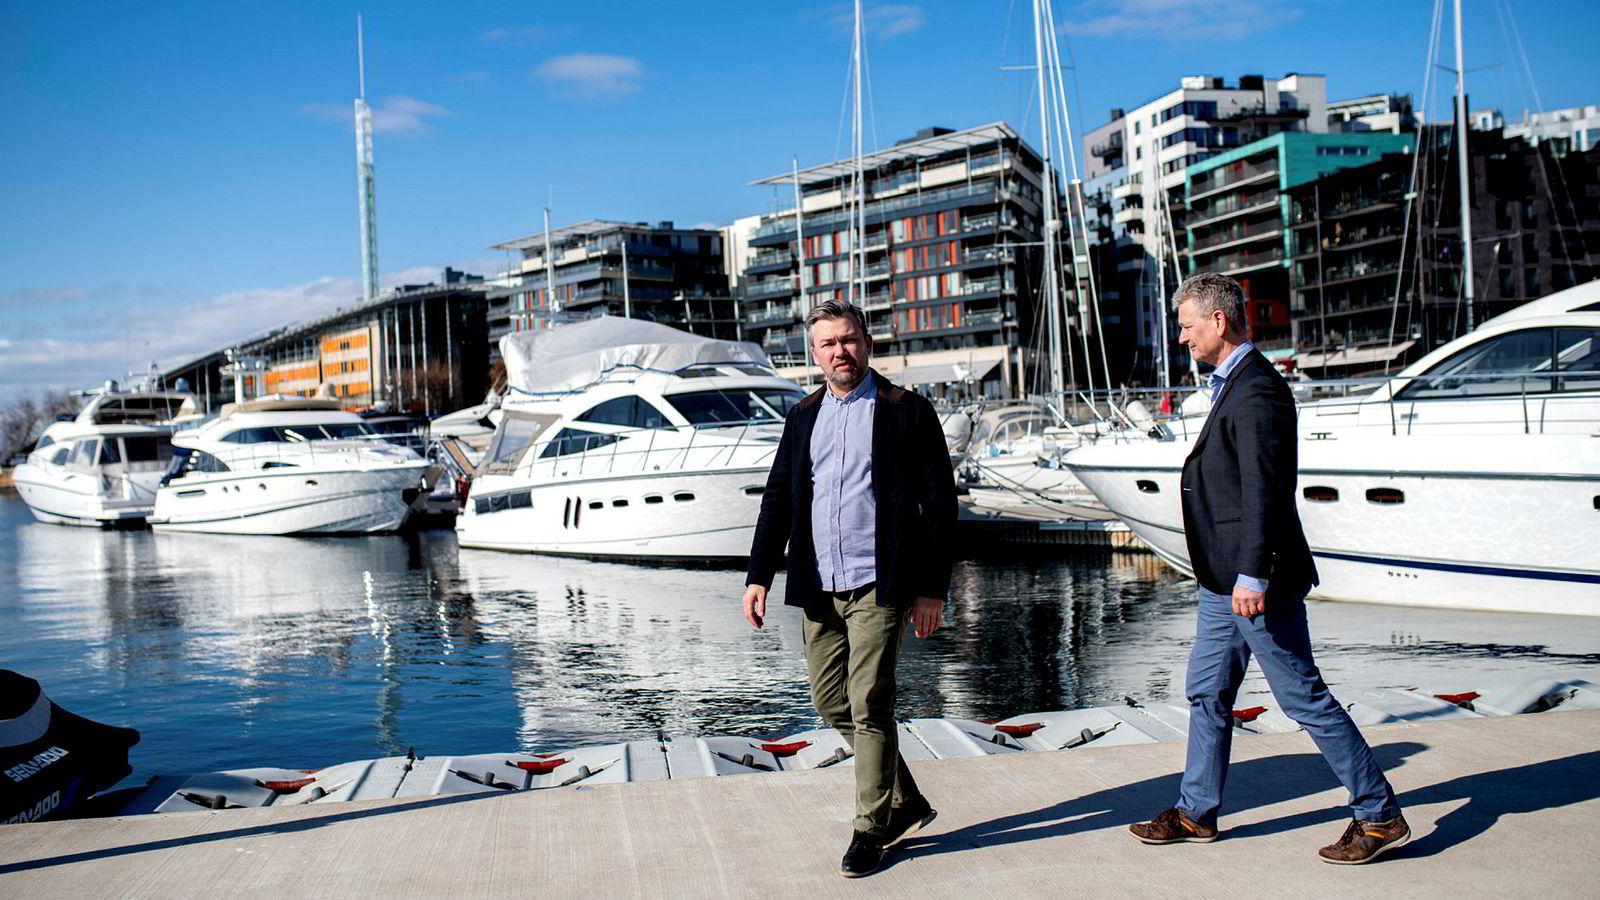 Gründerne i Kruser, Christer Ervik, til venstre, og Thorbjørn Rekdal starter opp et tilbud for båtdeling i Oslofjorden i år. Foto: Fartein Rudjord